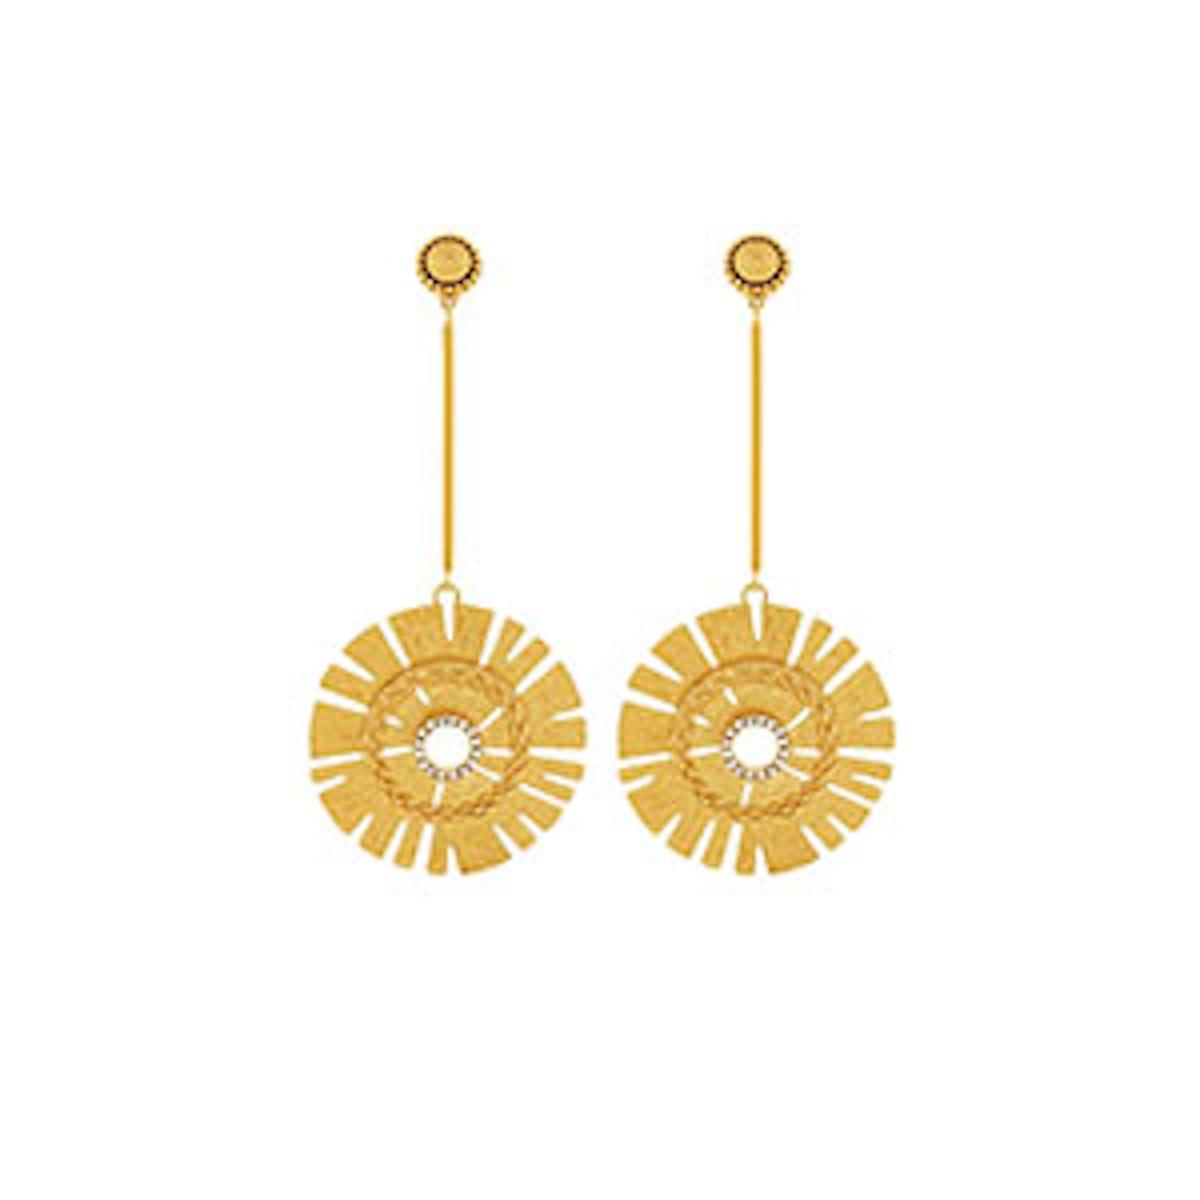 Natasha Starburst Earrings